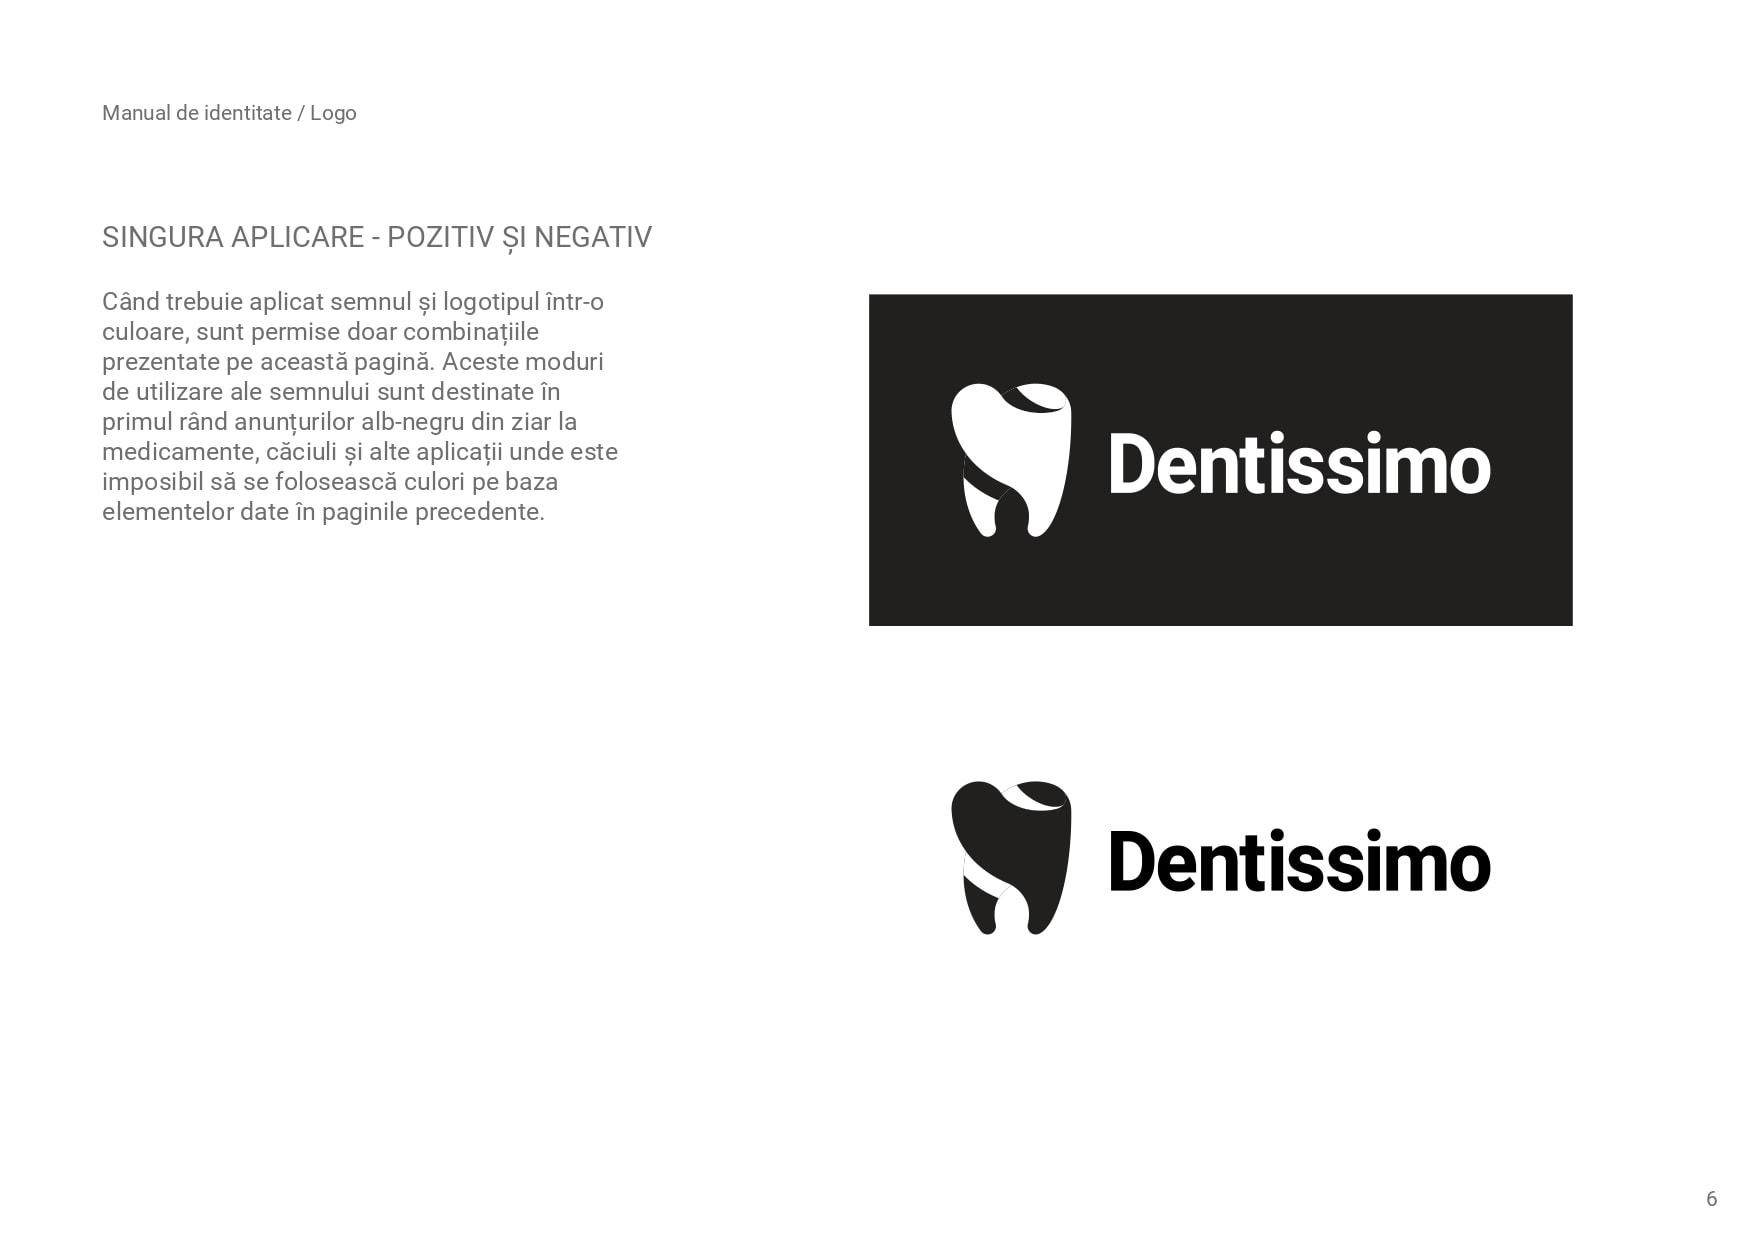 Dentissimologoalb negru